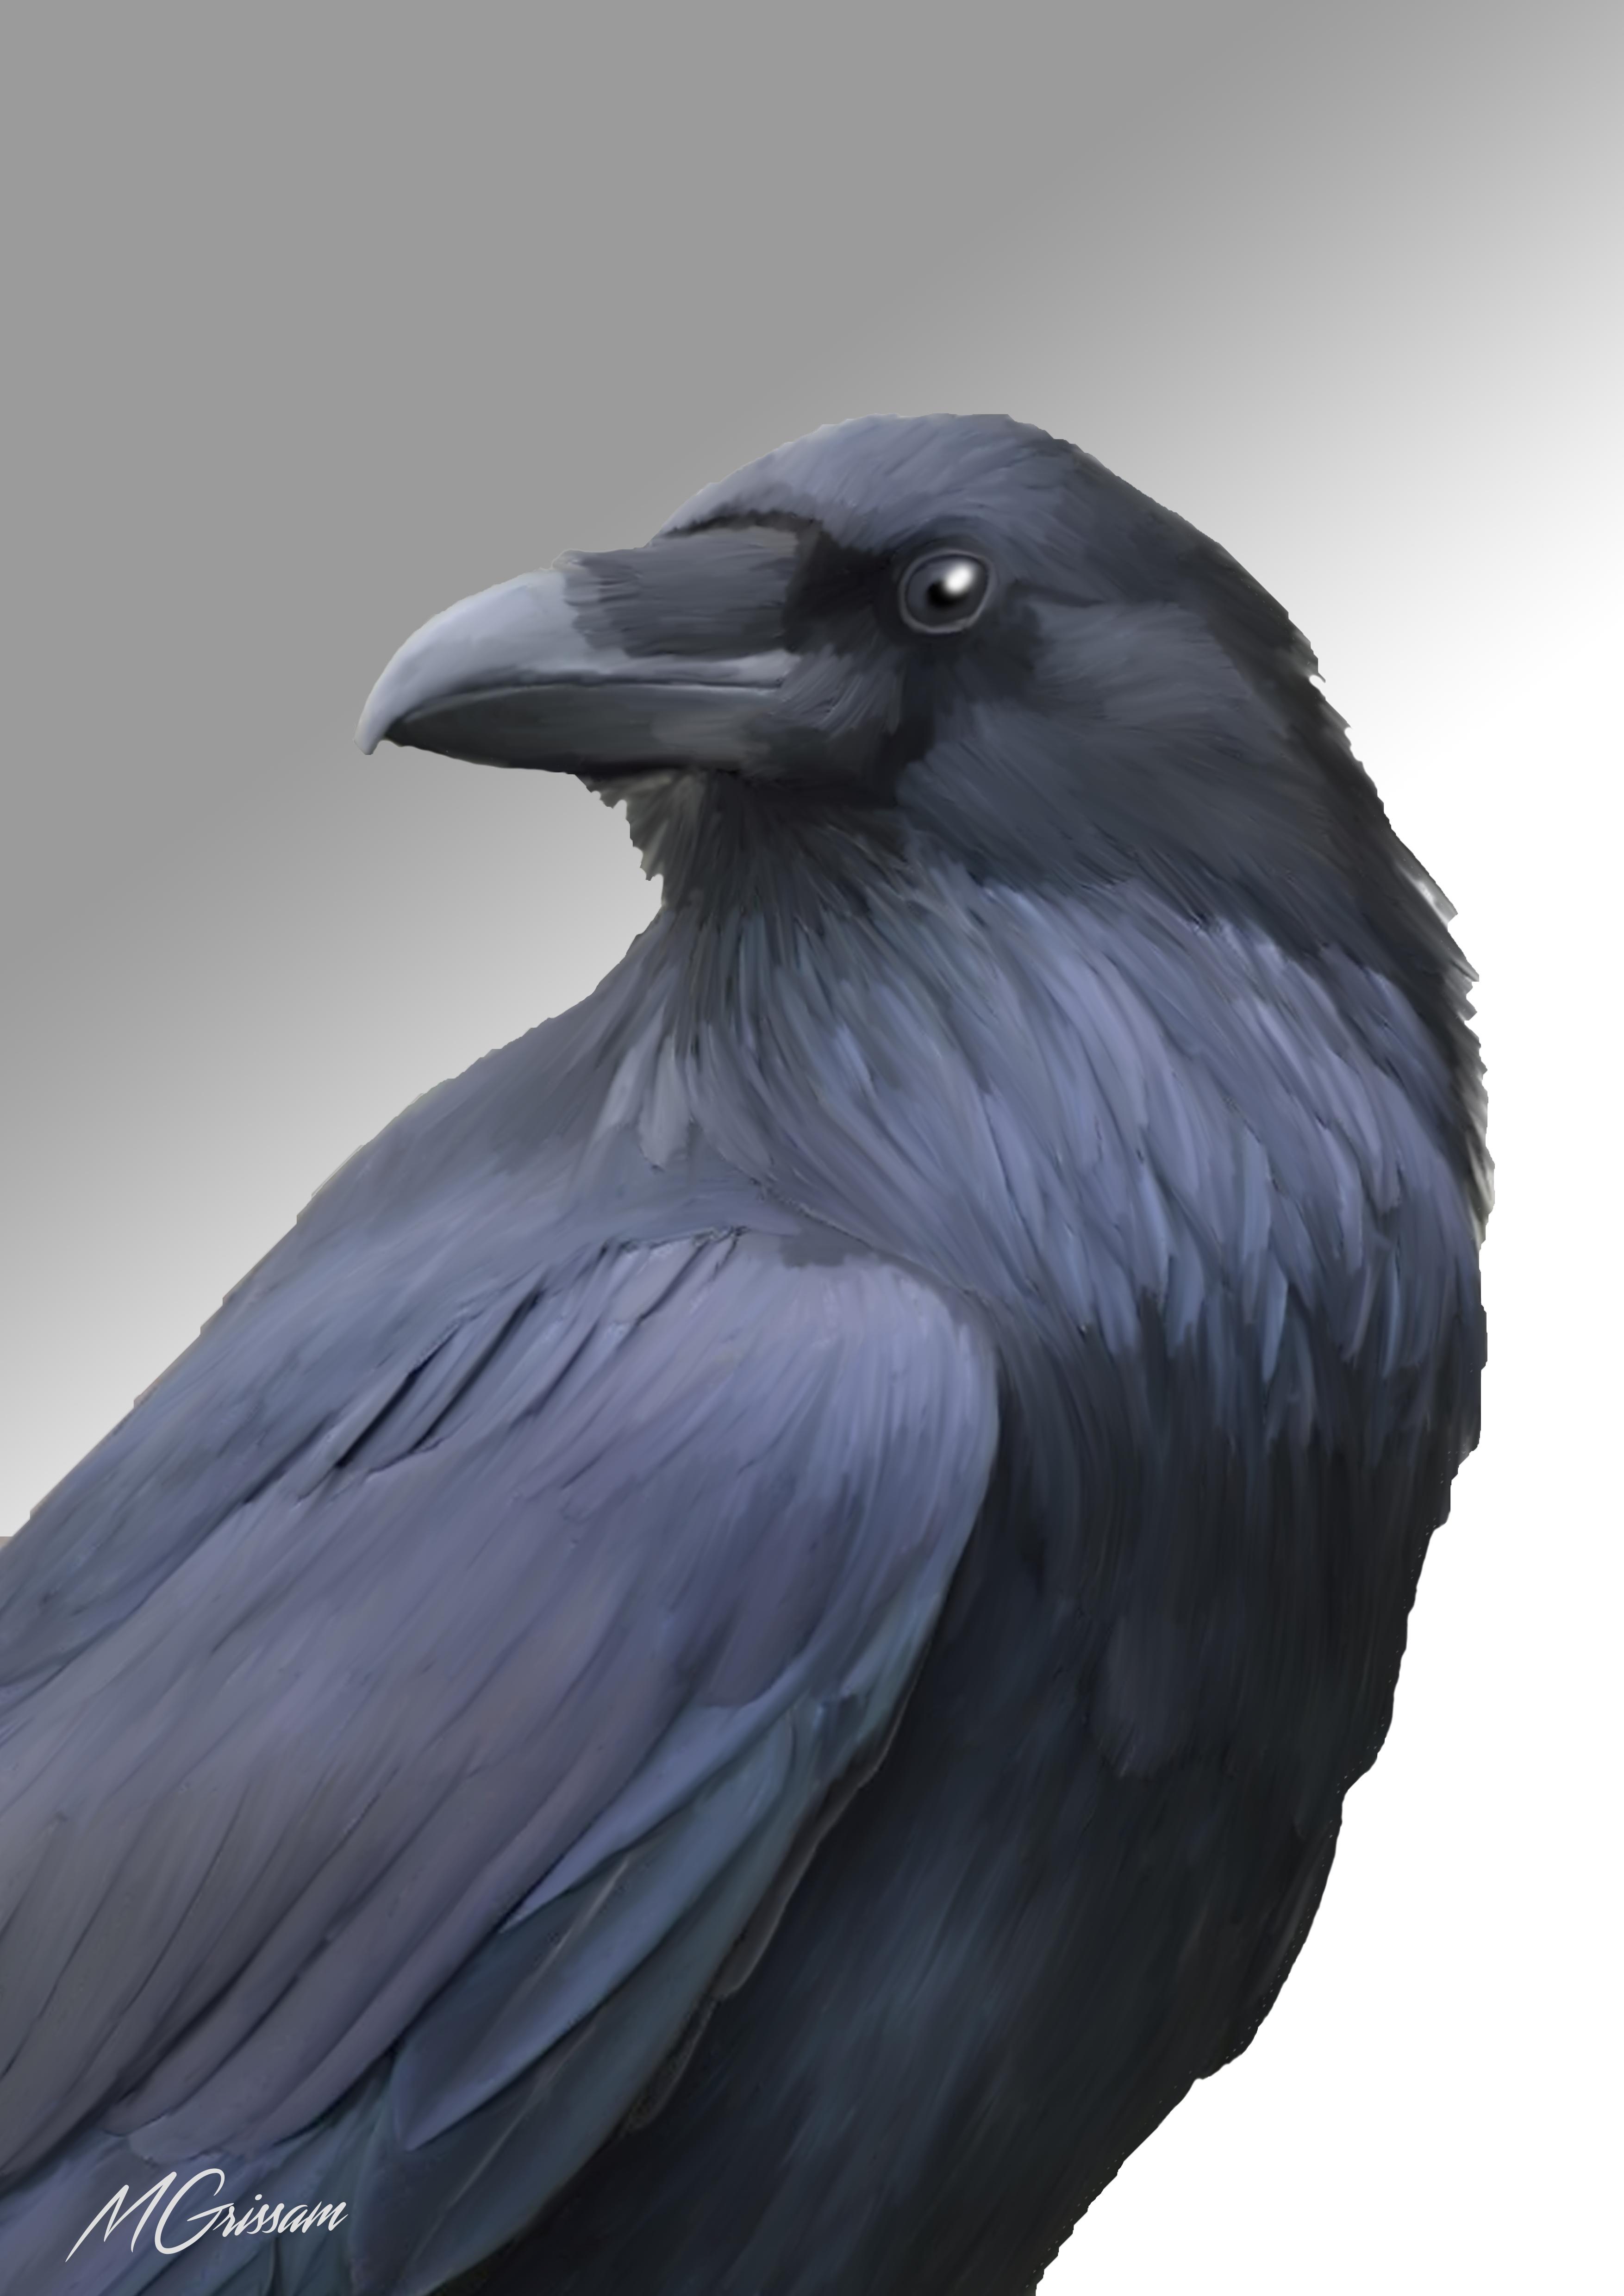 Ravy the Raven